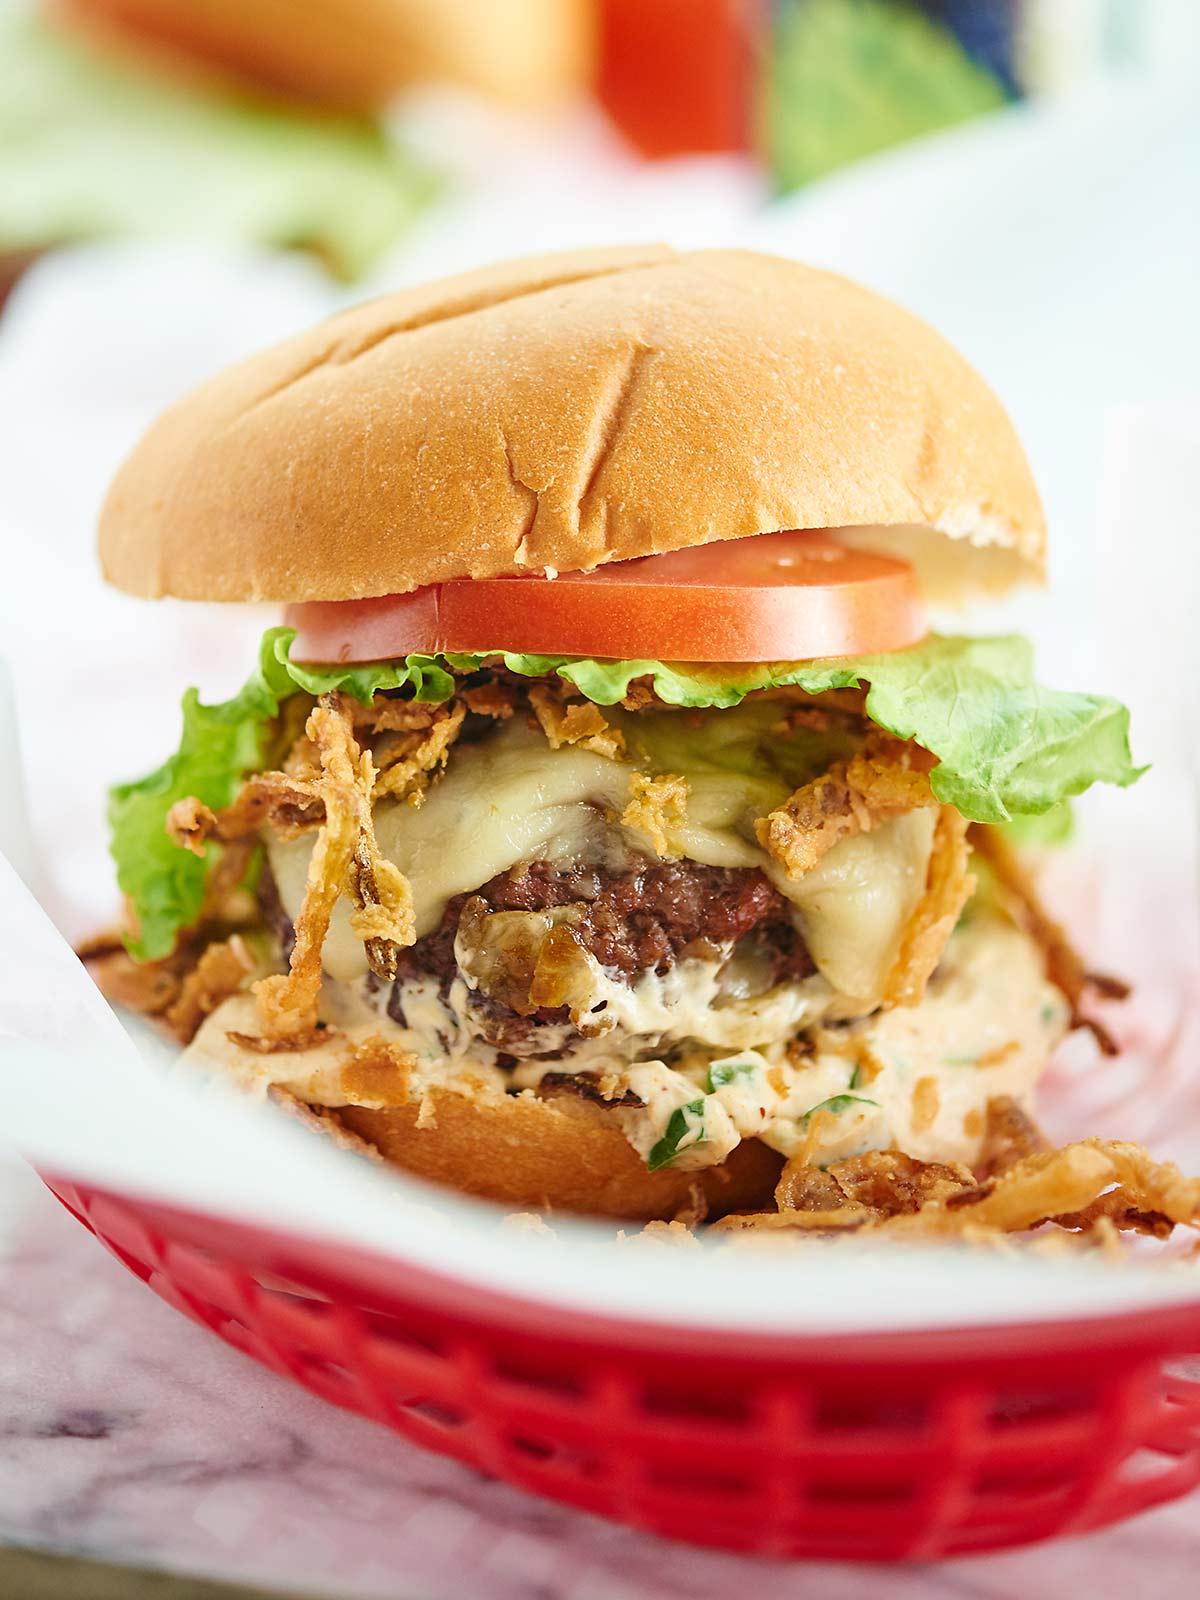 Pepper-Jack-Stuffed-Burger-Jalapeno-Cream-Sauce-Final2